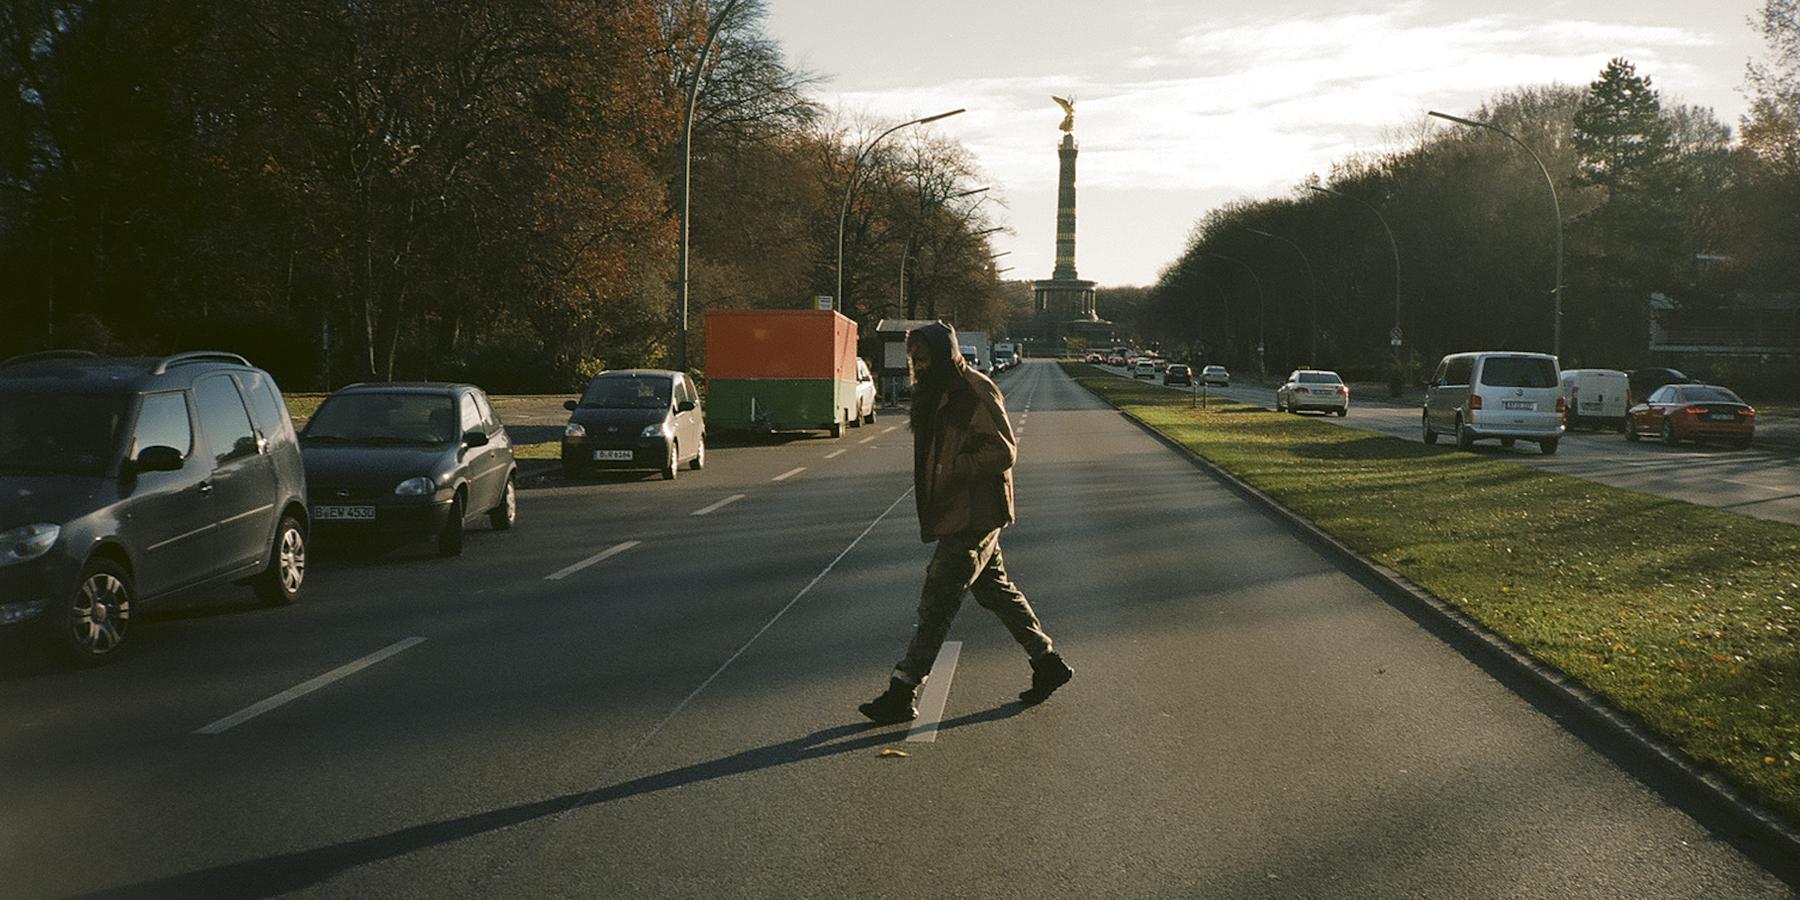 BEINGHUNTED. Carhartt WIP The Essence of Progress - Dirk Bonn Chore Jacket